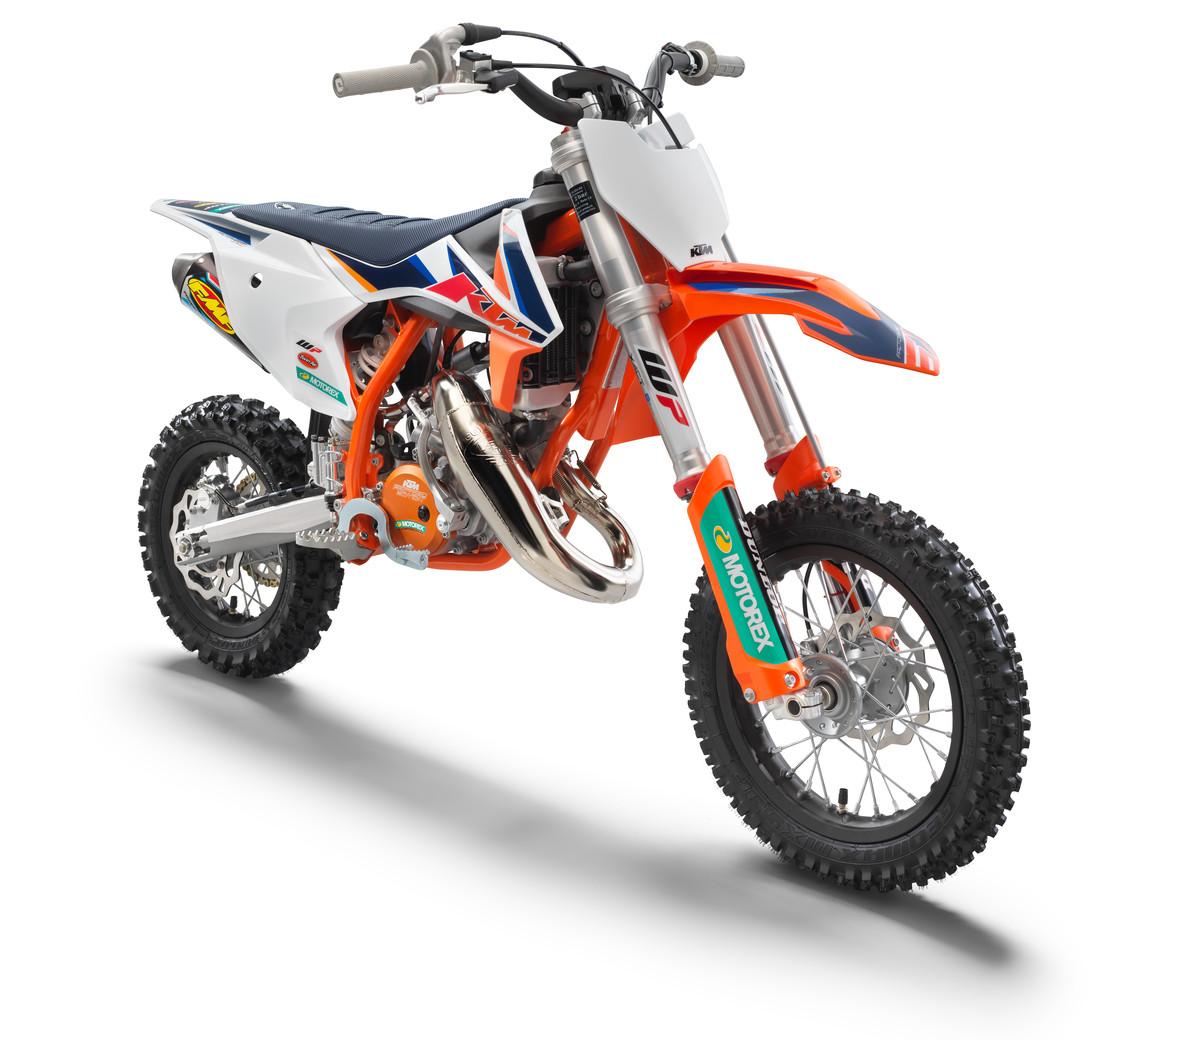 2022 KTM 50 SX FACTORY EDITION (1)